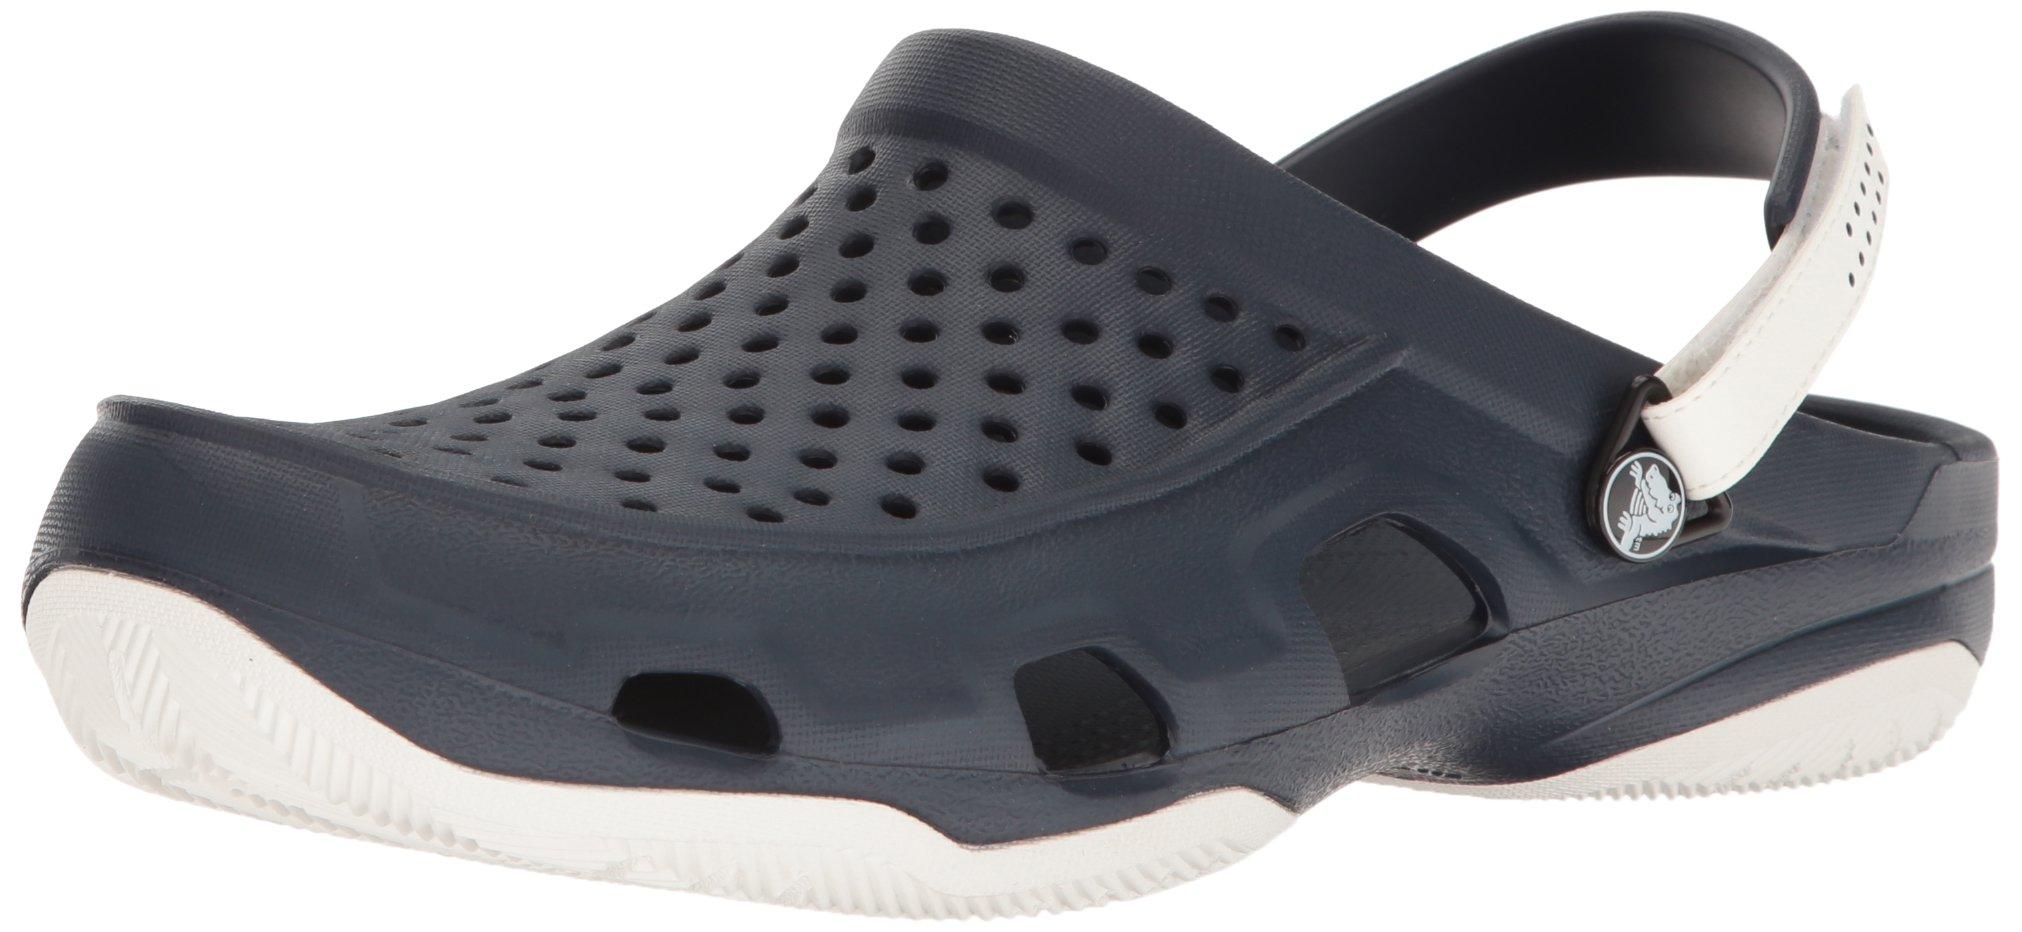 crocs Men's Swiftwater Deck Clog M Mule, Navy/White, 10 M US